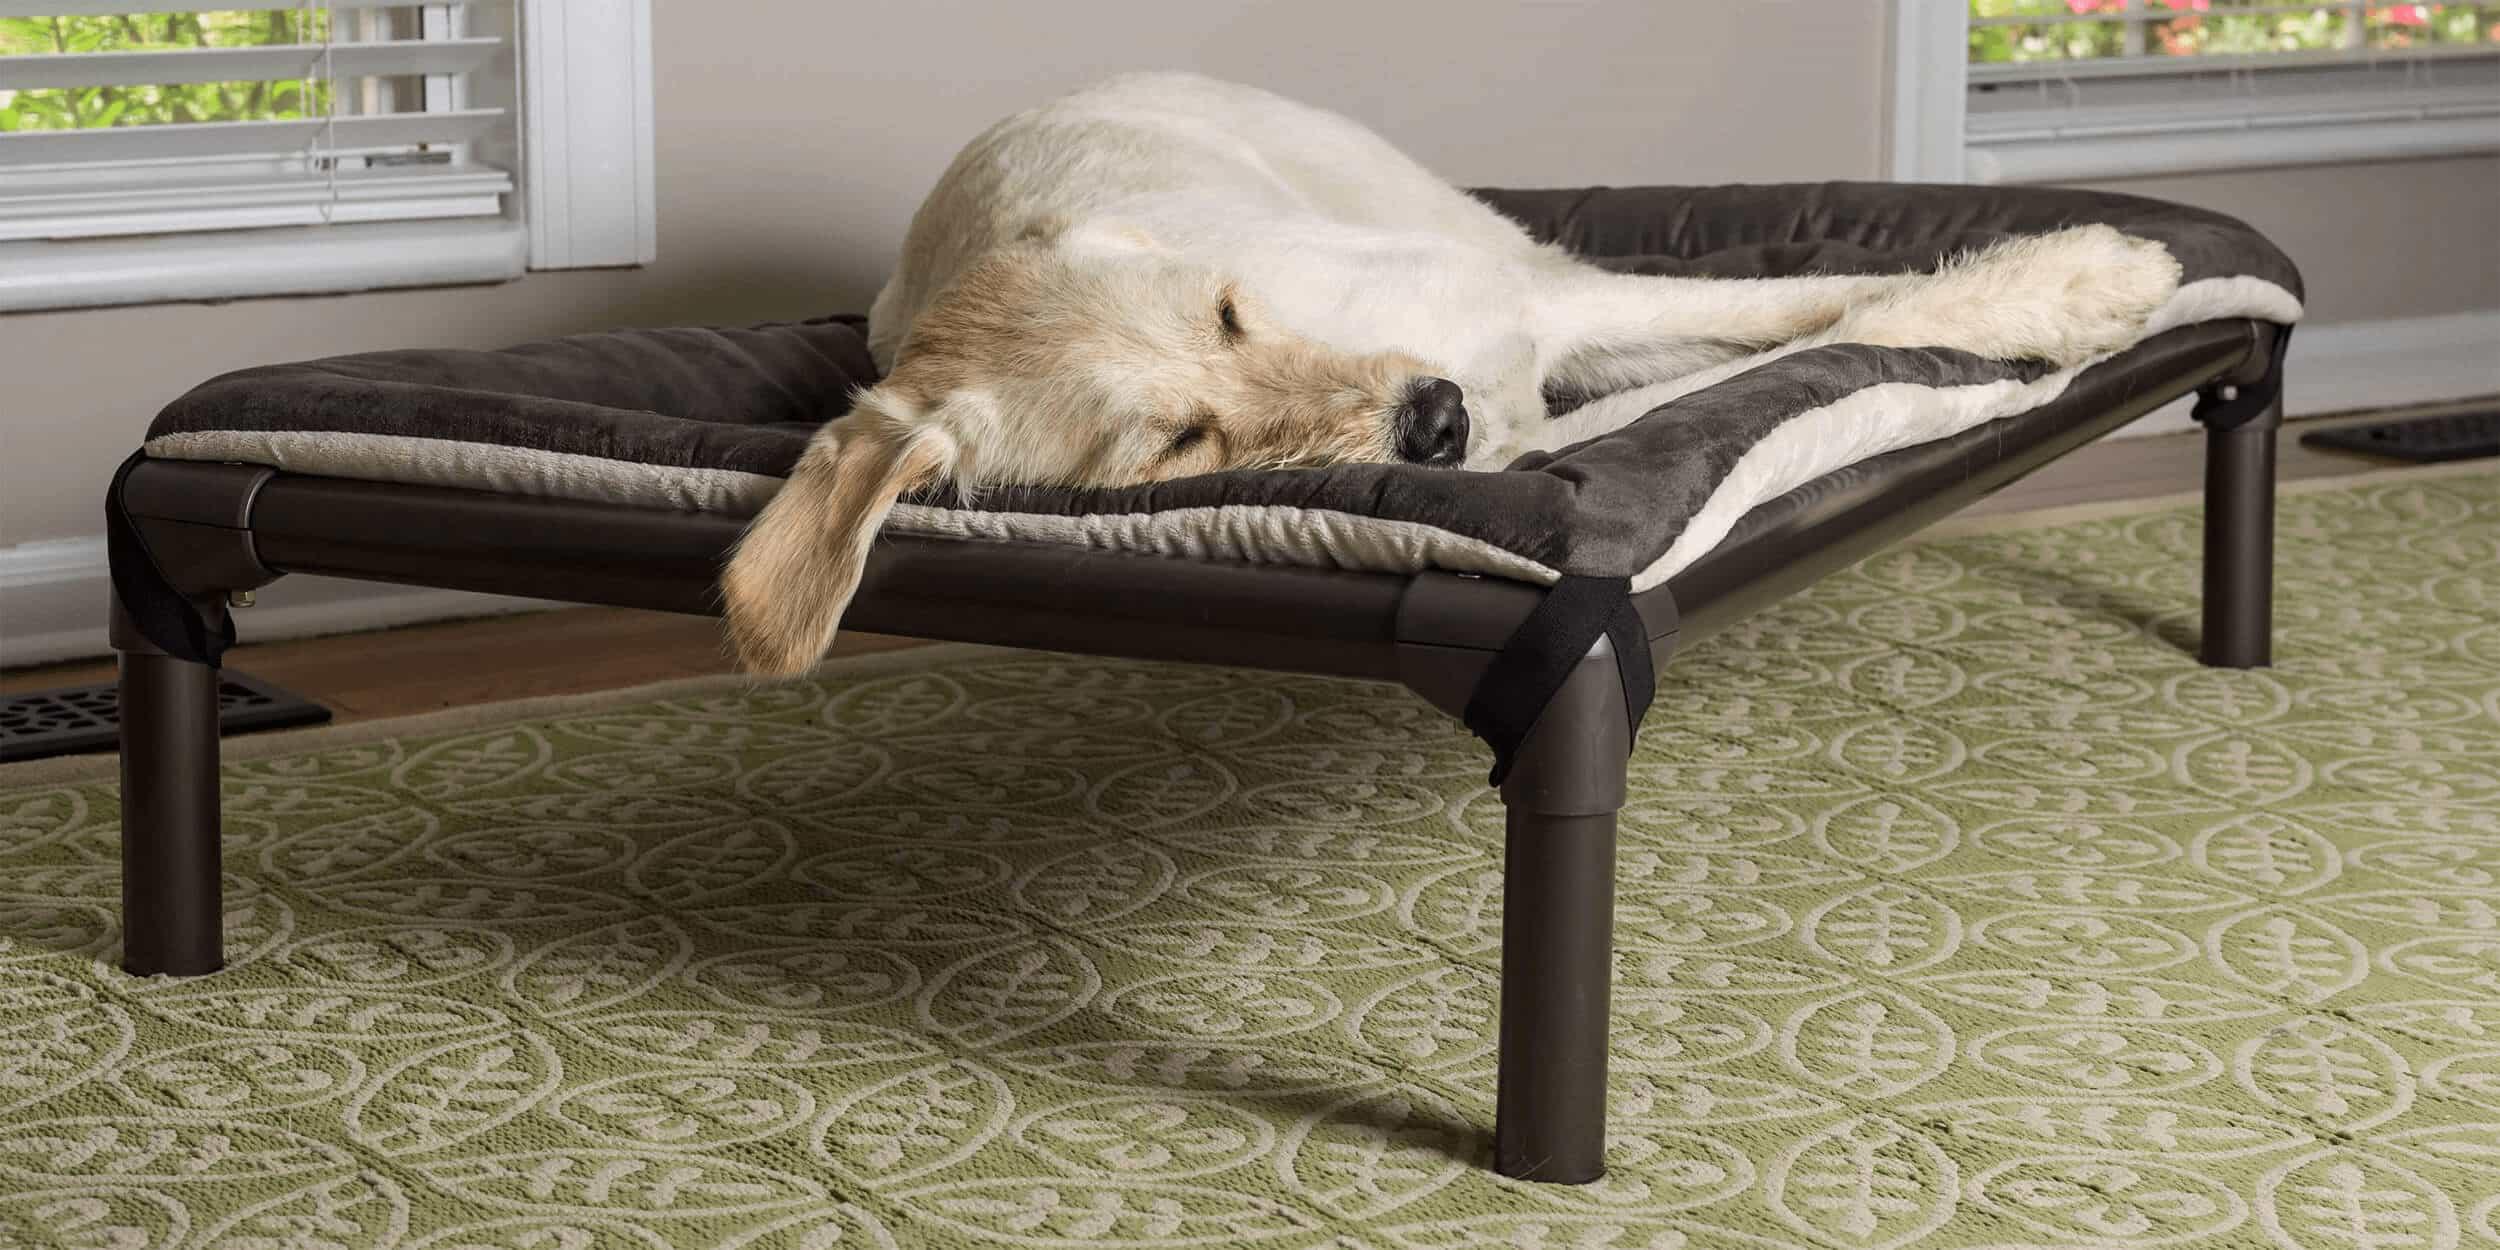 9bbe95291805 Kuranda Dog Beds® | Chew Proof Dog Beds